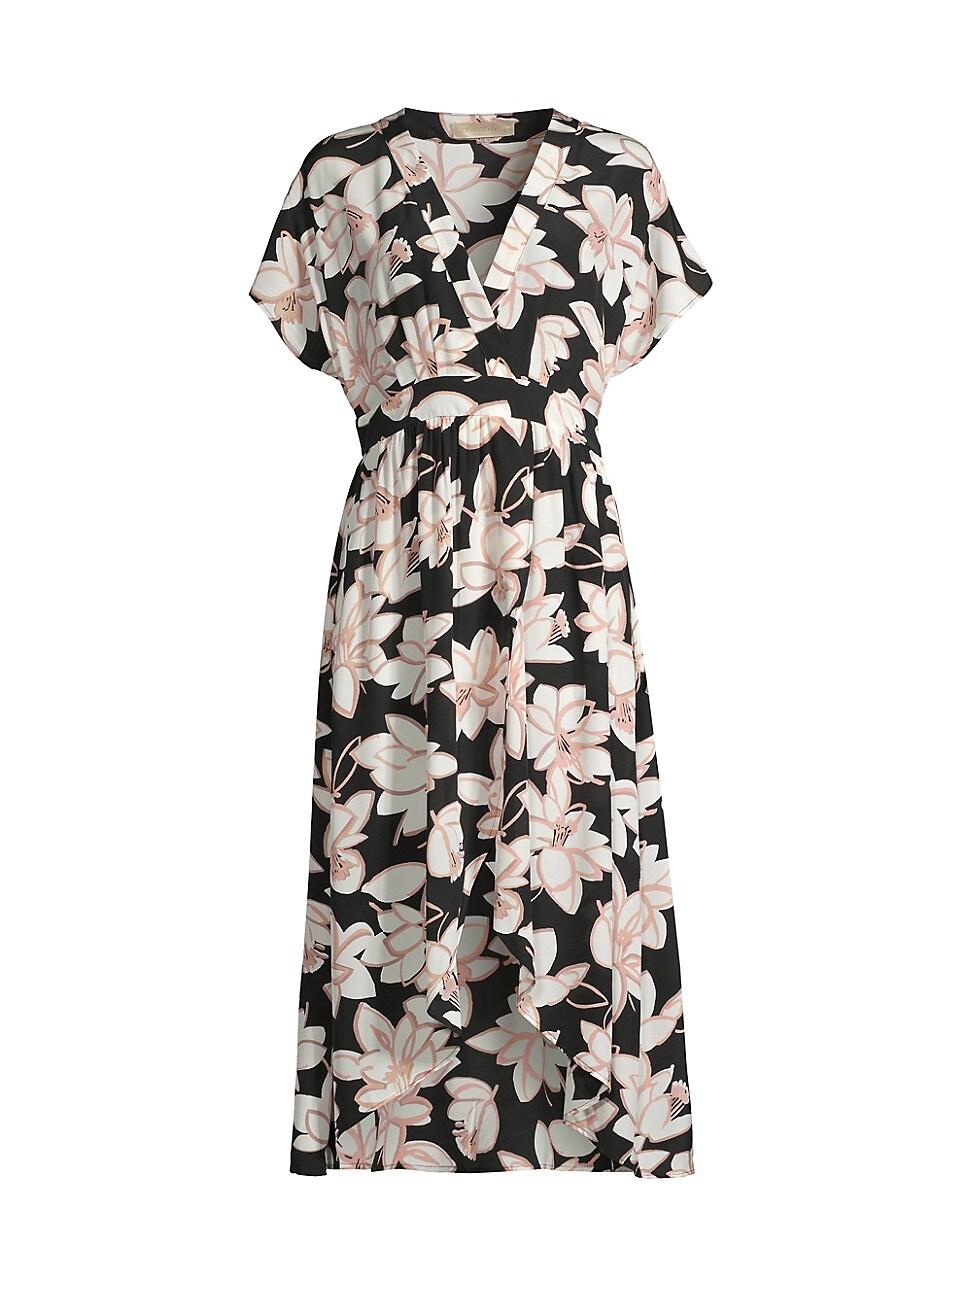 Momoní WOMEN'S VARESE FLORAL SILK A-LINE DRESS